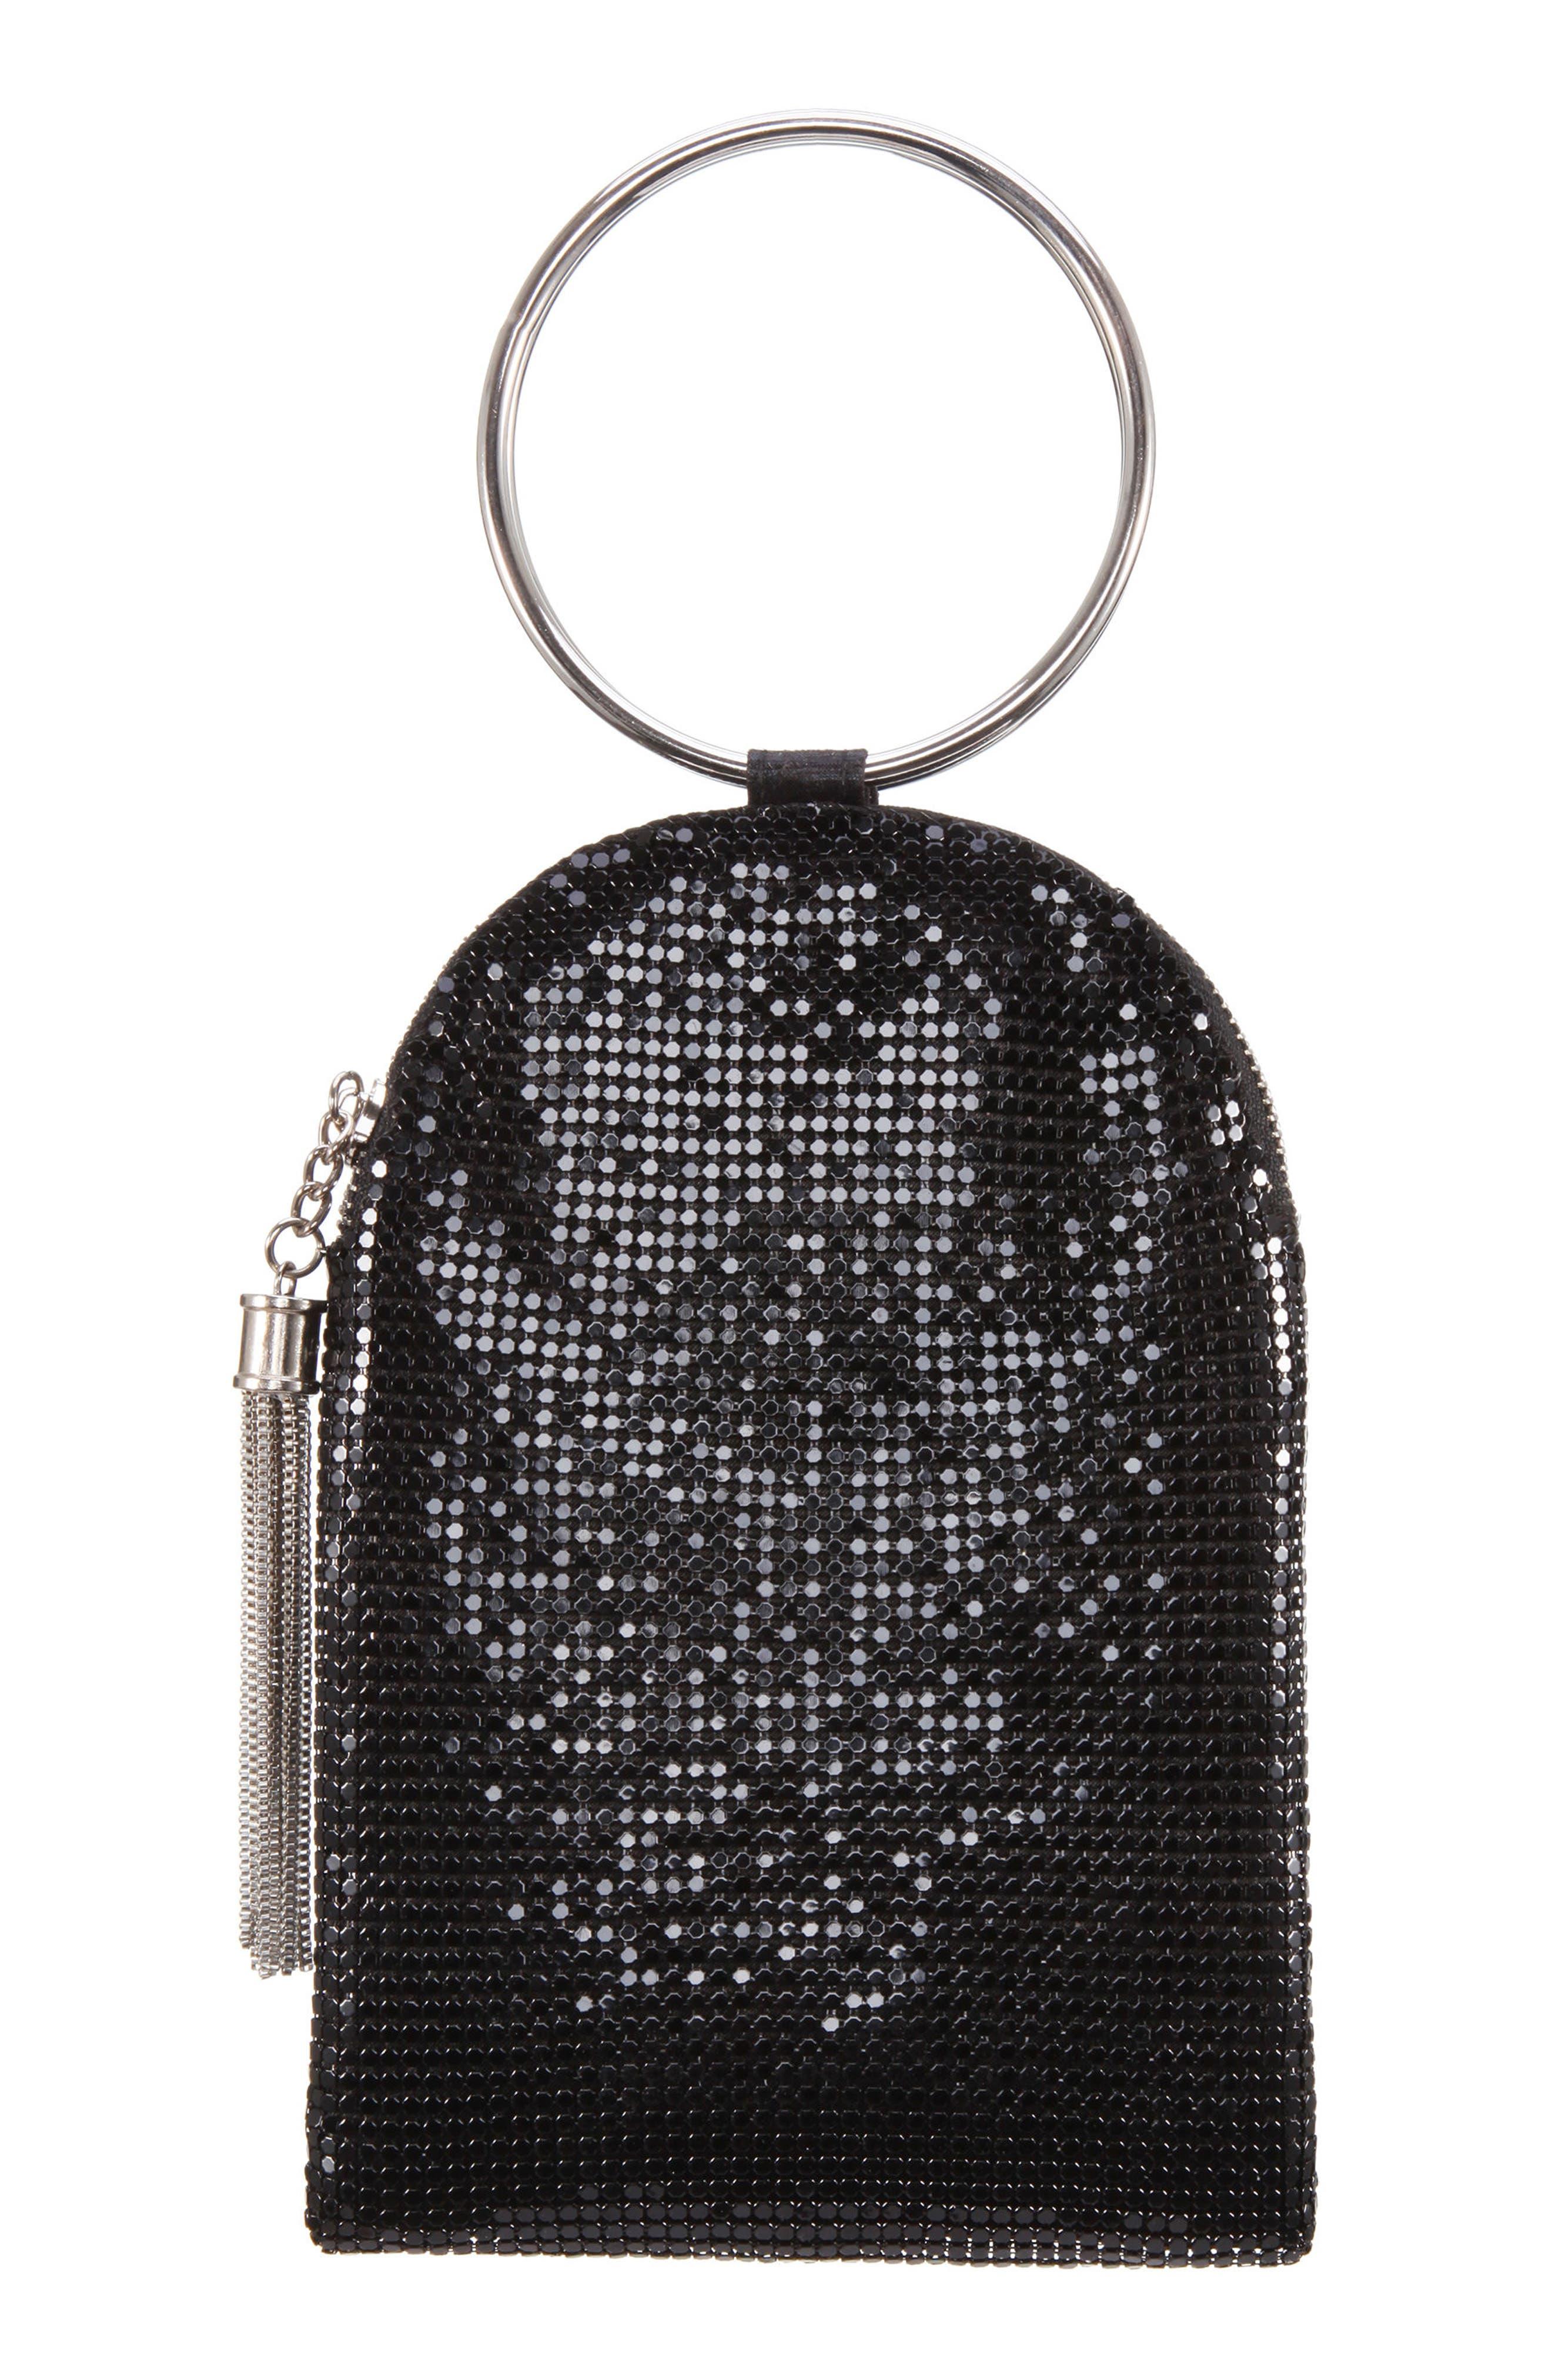 NINA, Metallic Mesh Handbag, Alternate thumbnail 2, color, BLACK